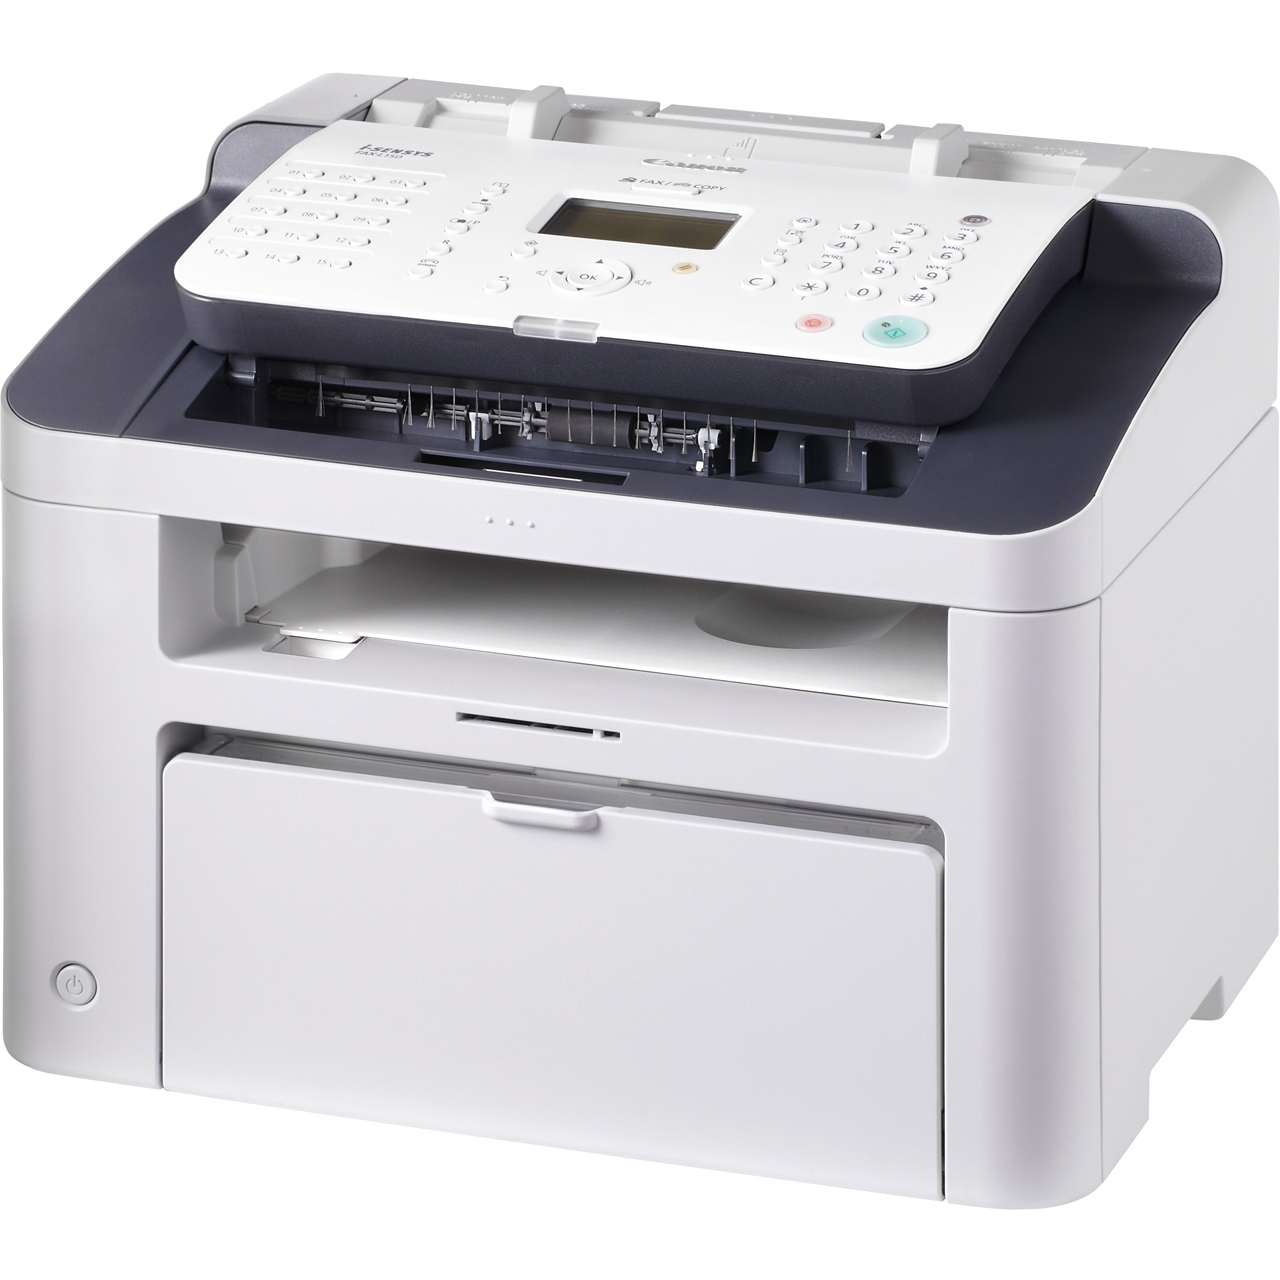 CANON i-SENSYS FAX-L150 Laserfax Super G3 33.6kbps 12Kopien/Minute drucken bis 1200dpi 18ppm 512Seiten Faxspeicher